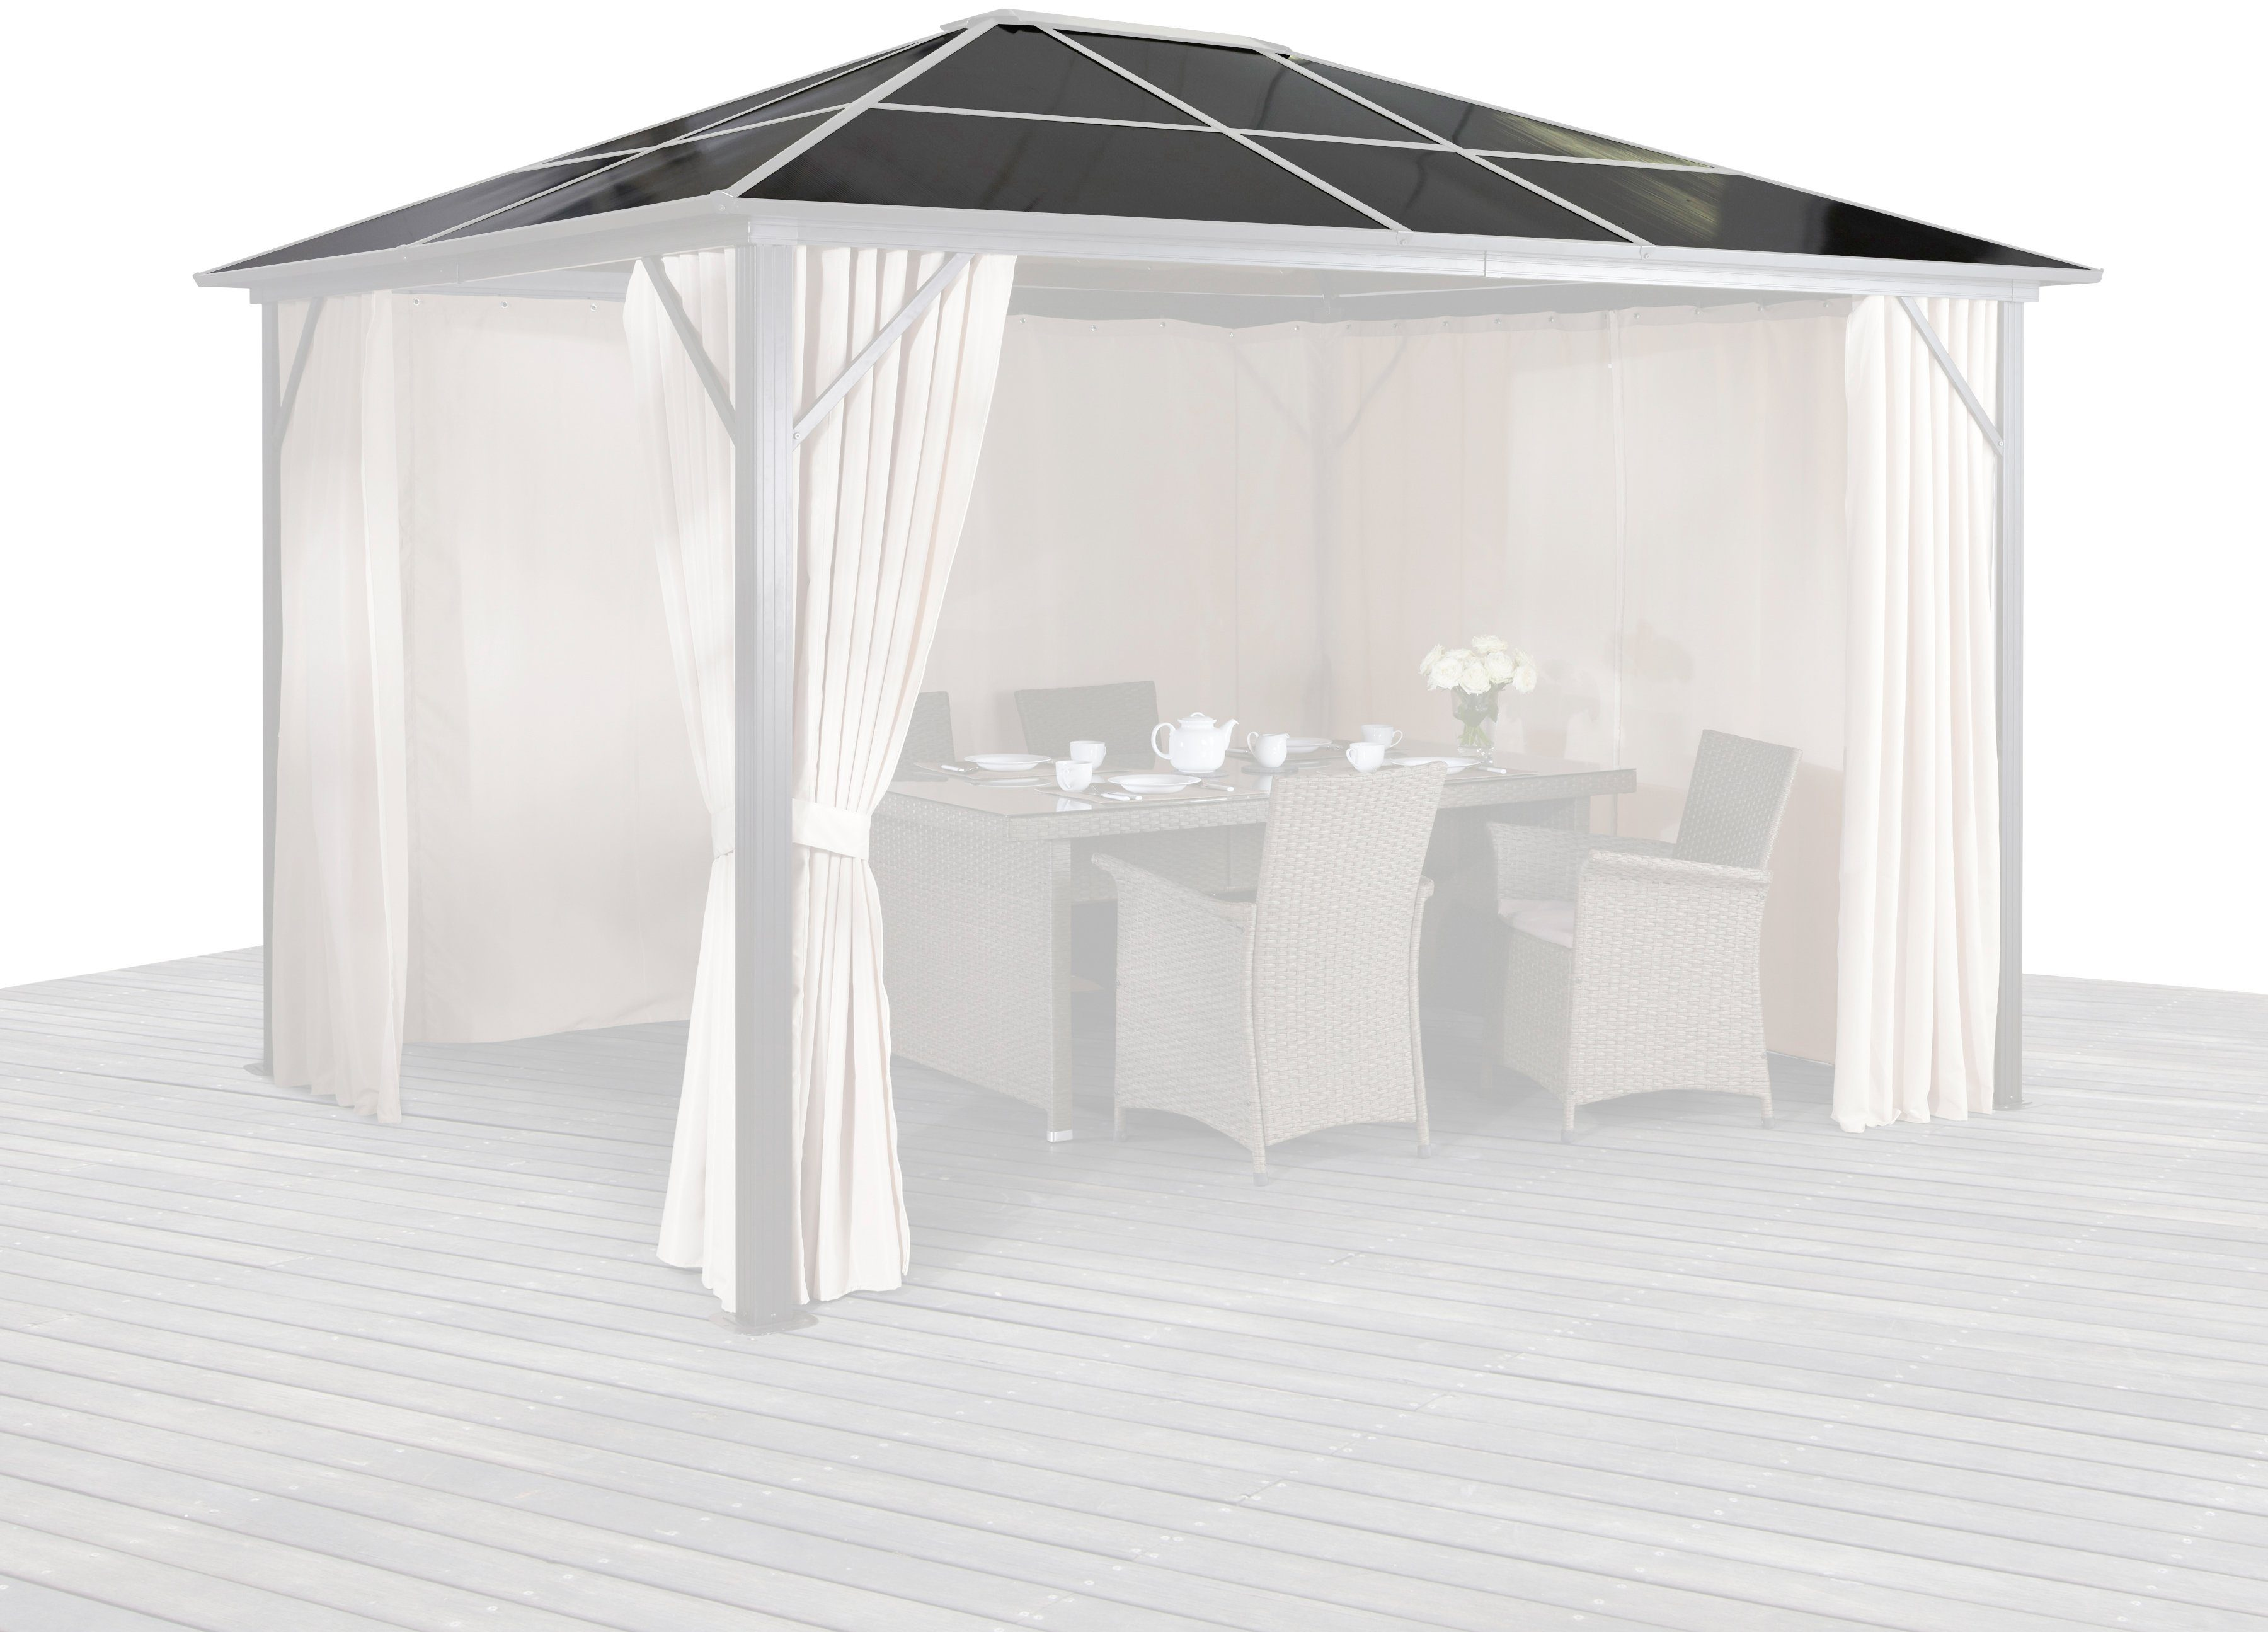 KONIFERA Ersatzdach für Pavillon »Aruba«, Dachplatten für »Aruba« 300x300 cm